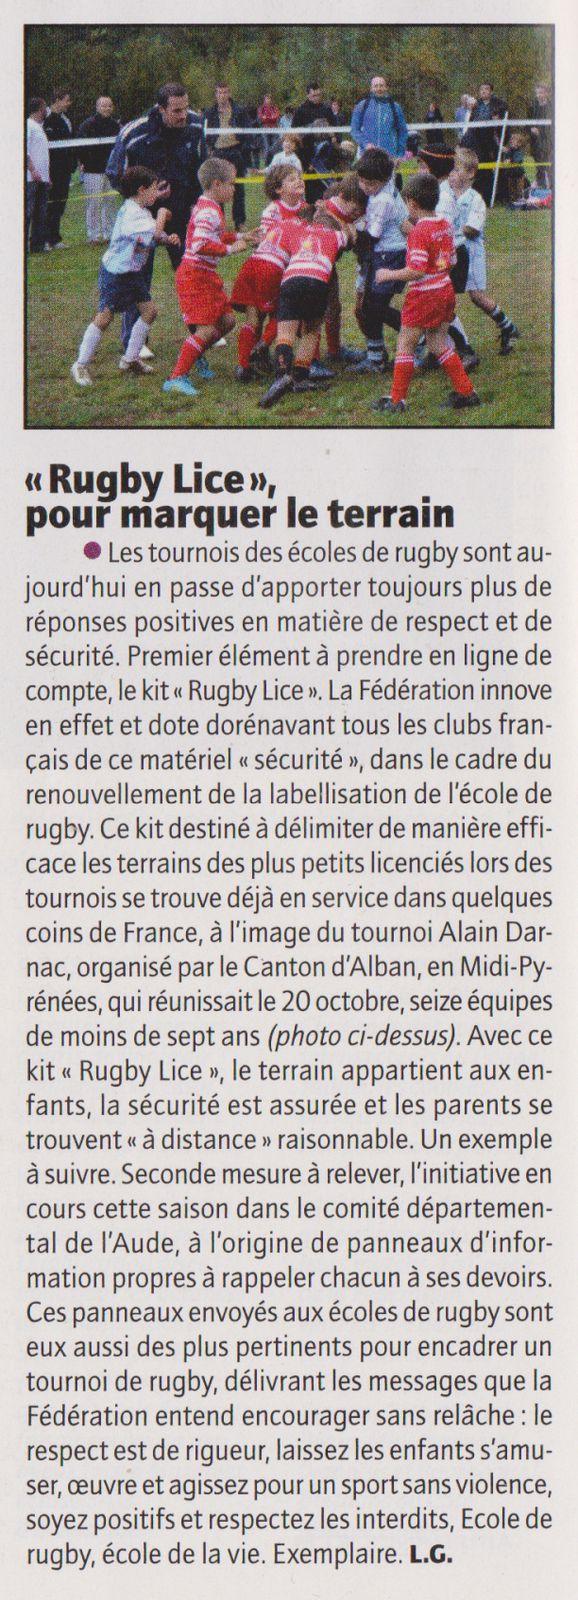 Rugby-LICE.jpg